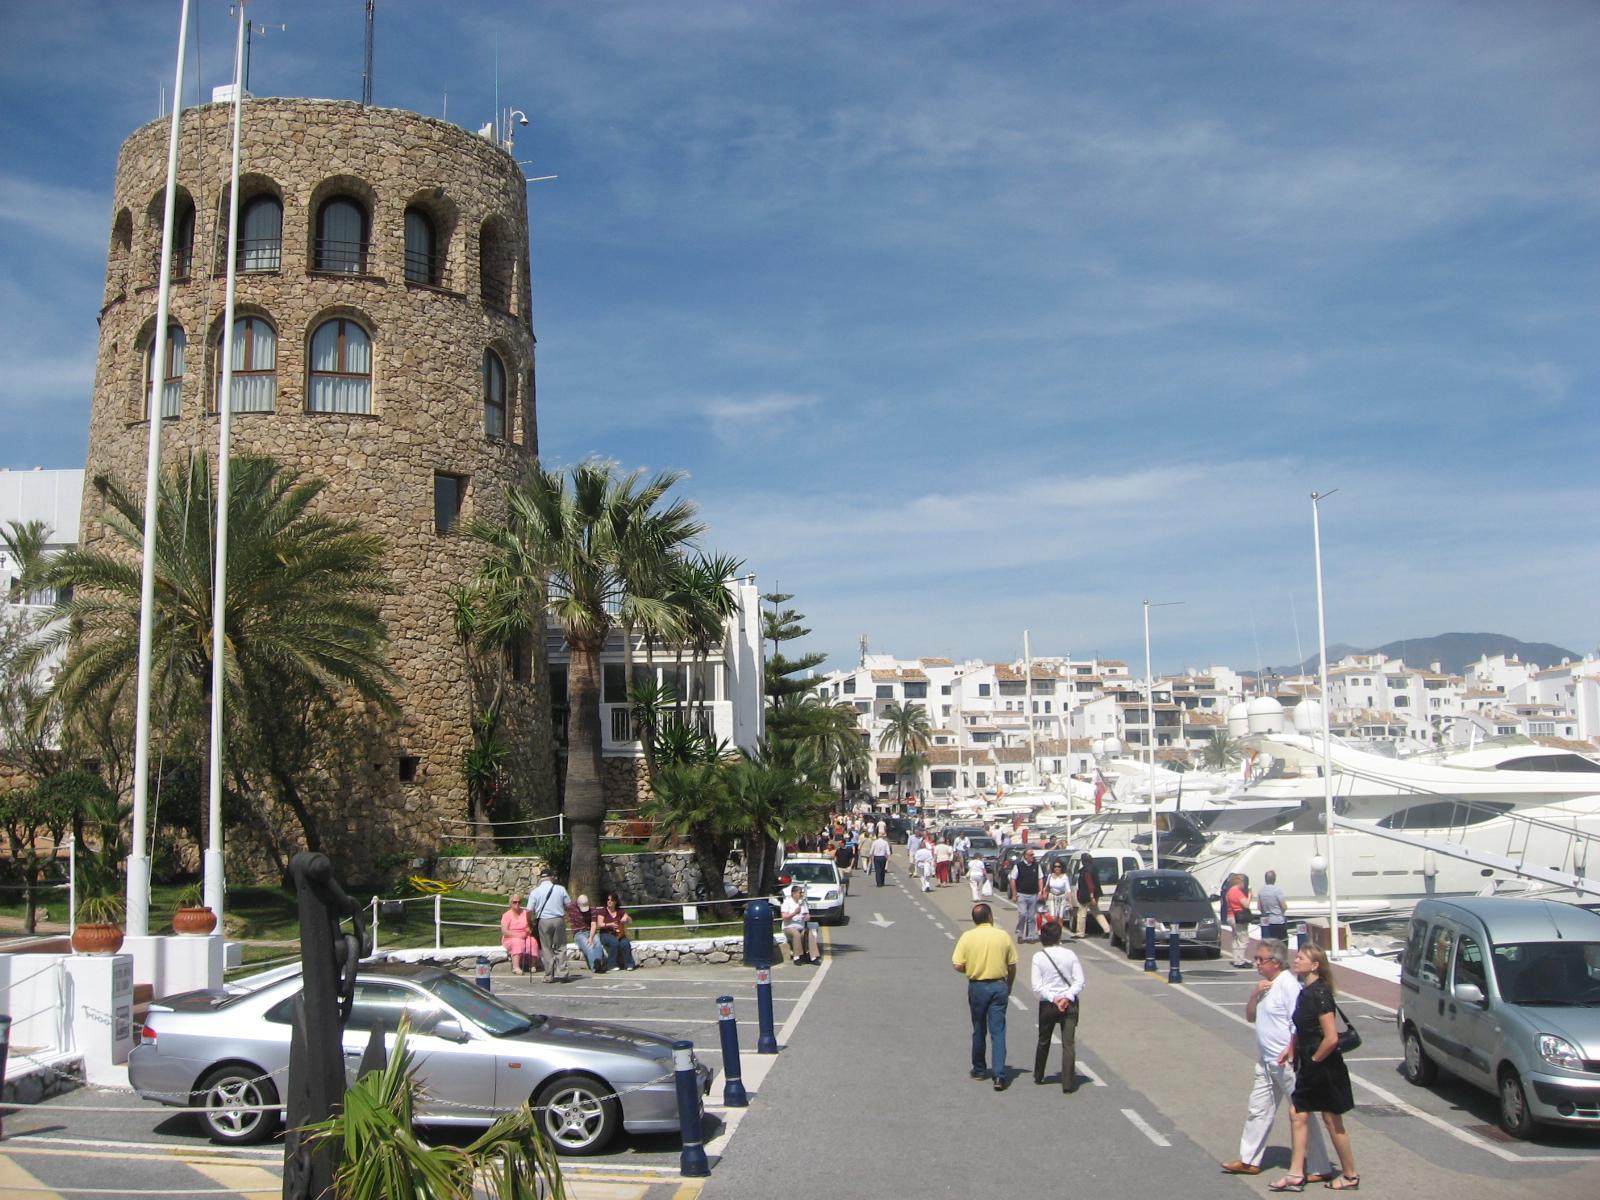 Marbella rich girls holiday spot rich club girl - Puerto banus marbella ...